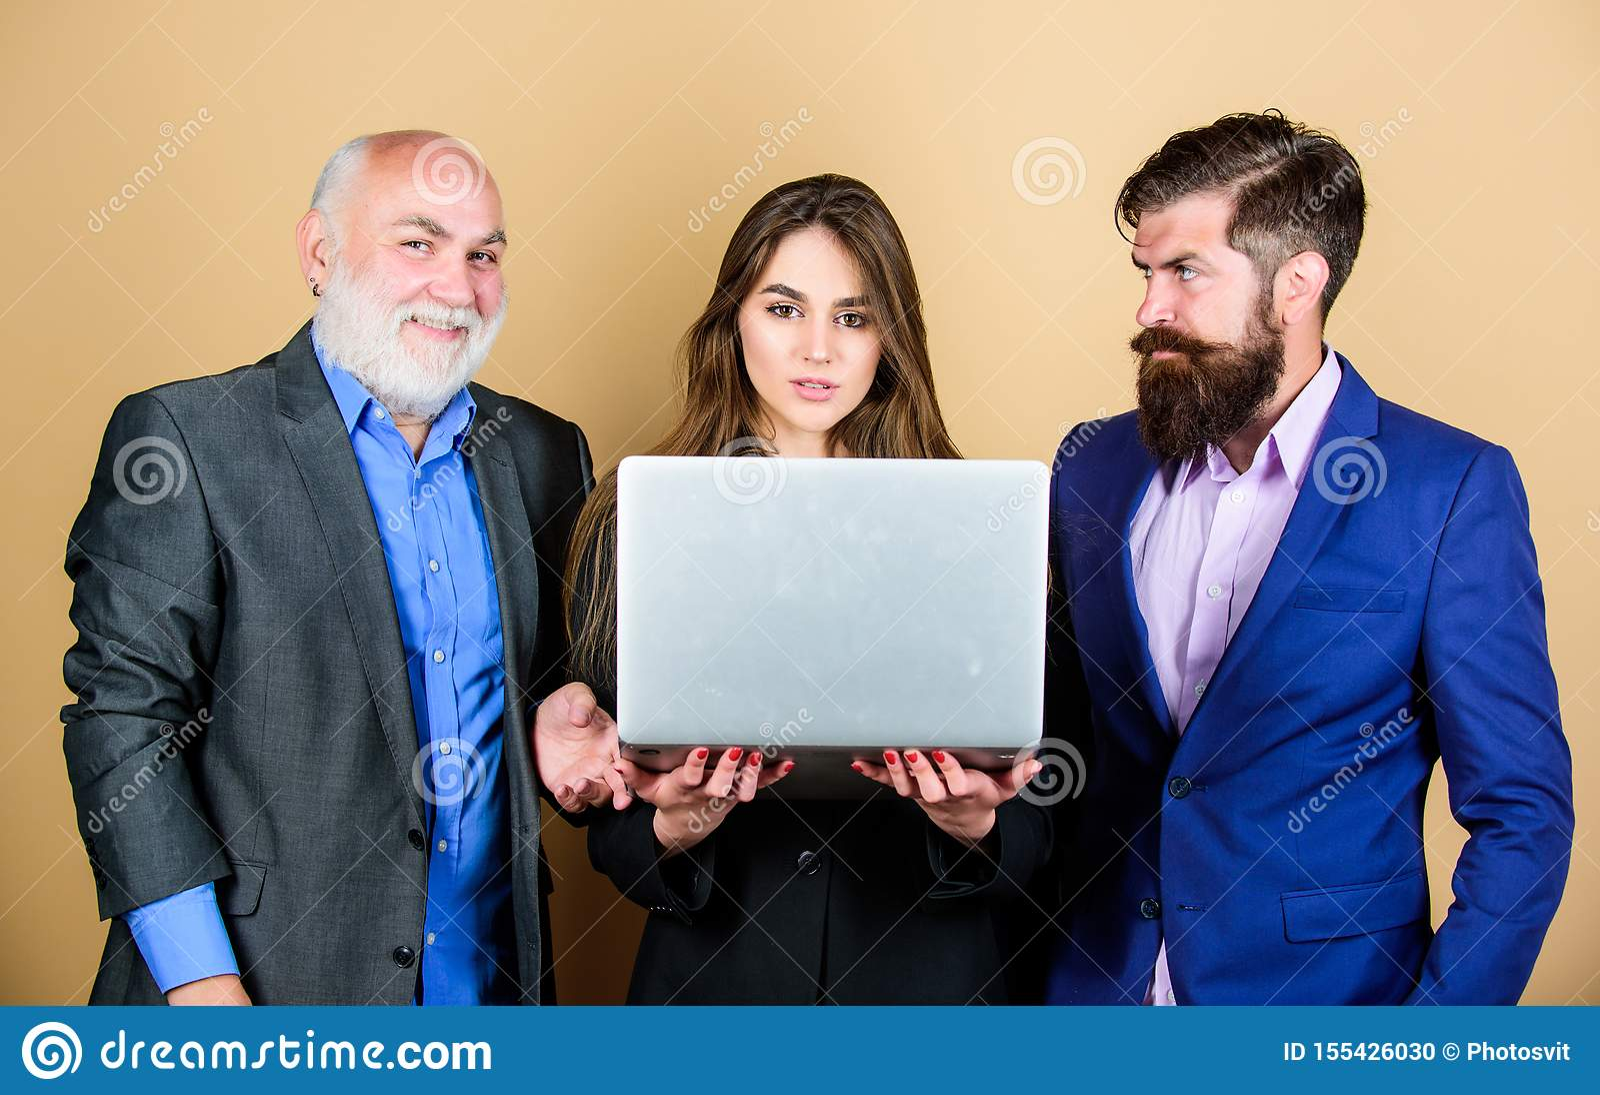 Discussing progress. Expert team. Business meeting. Men bearded manager show financial report laptop. Business plan